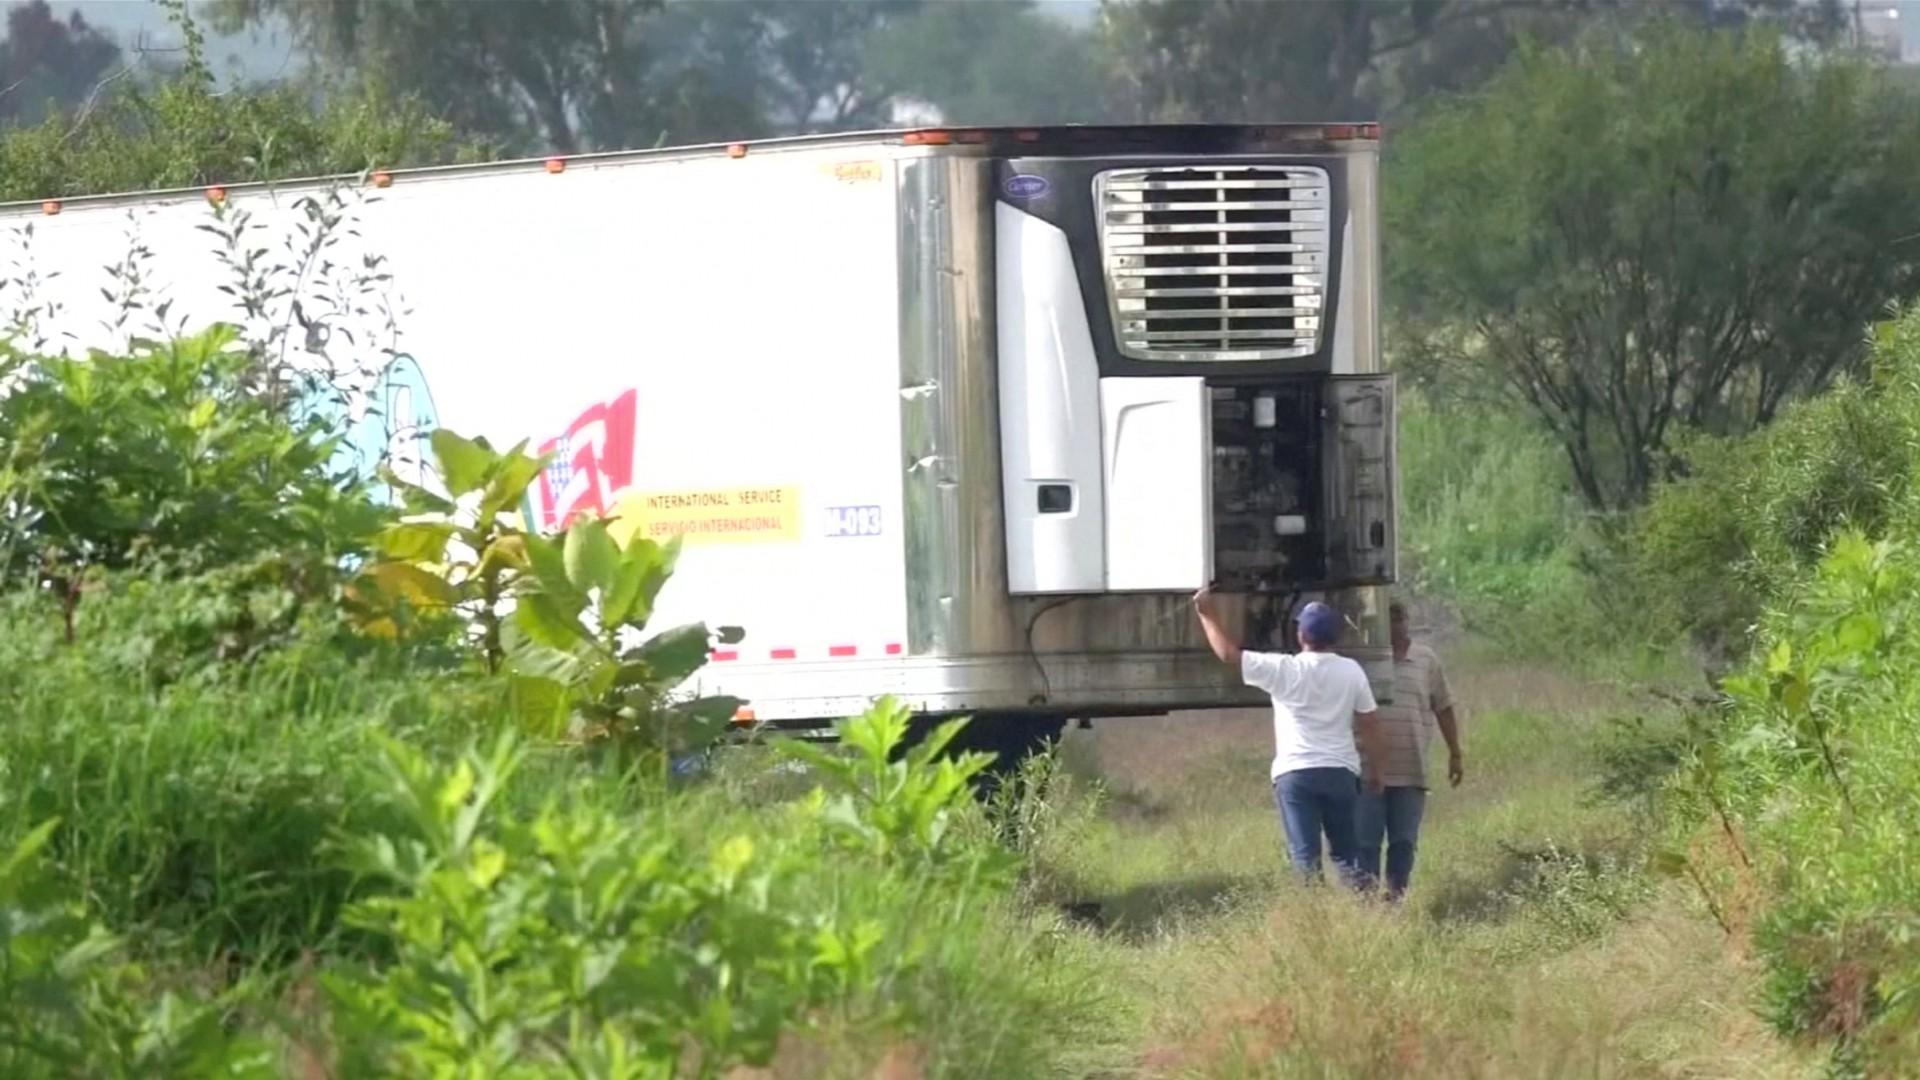 Cadaveres sin sitio en fiscalia forence Guadalajara Jalisco violencia